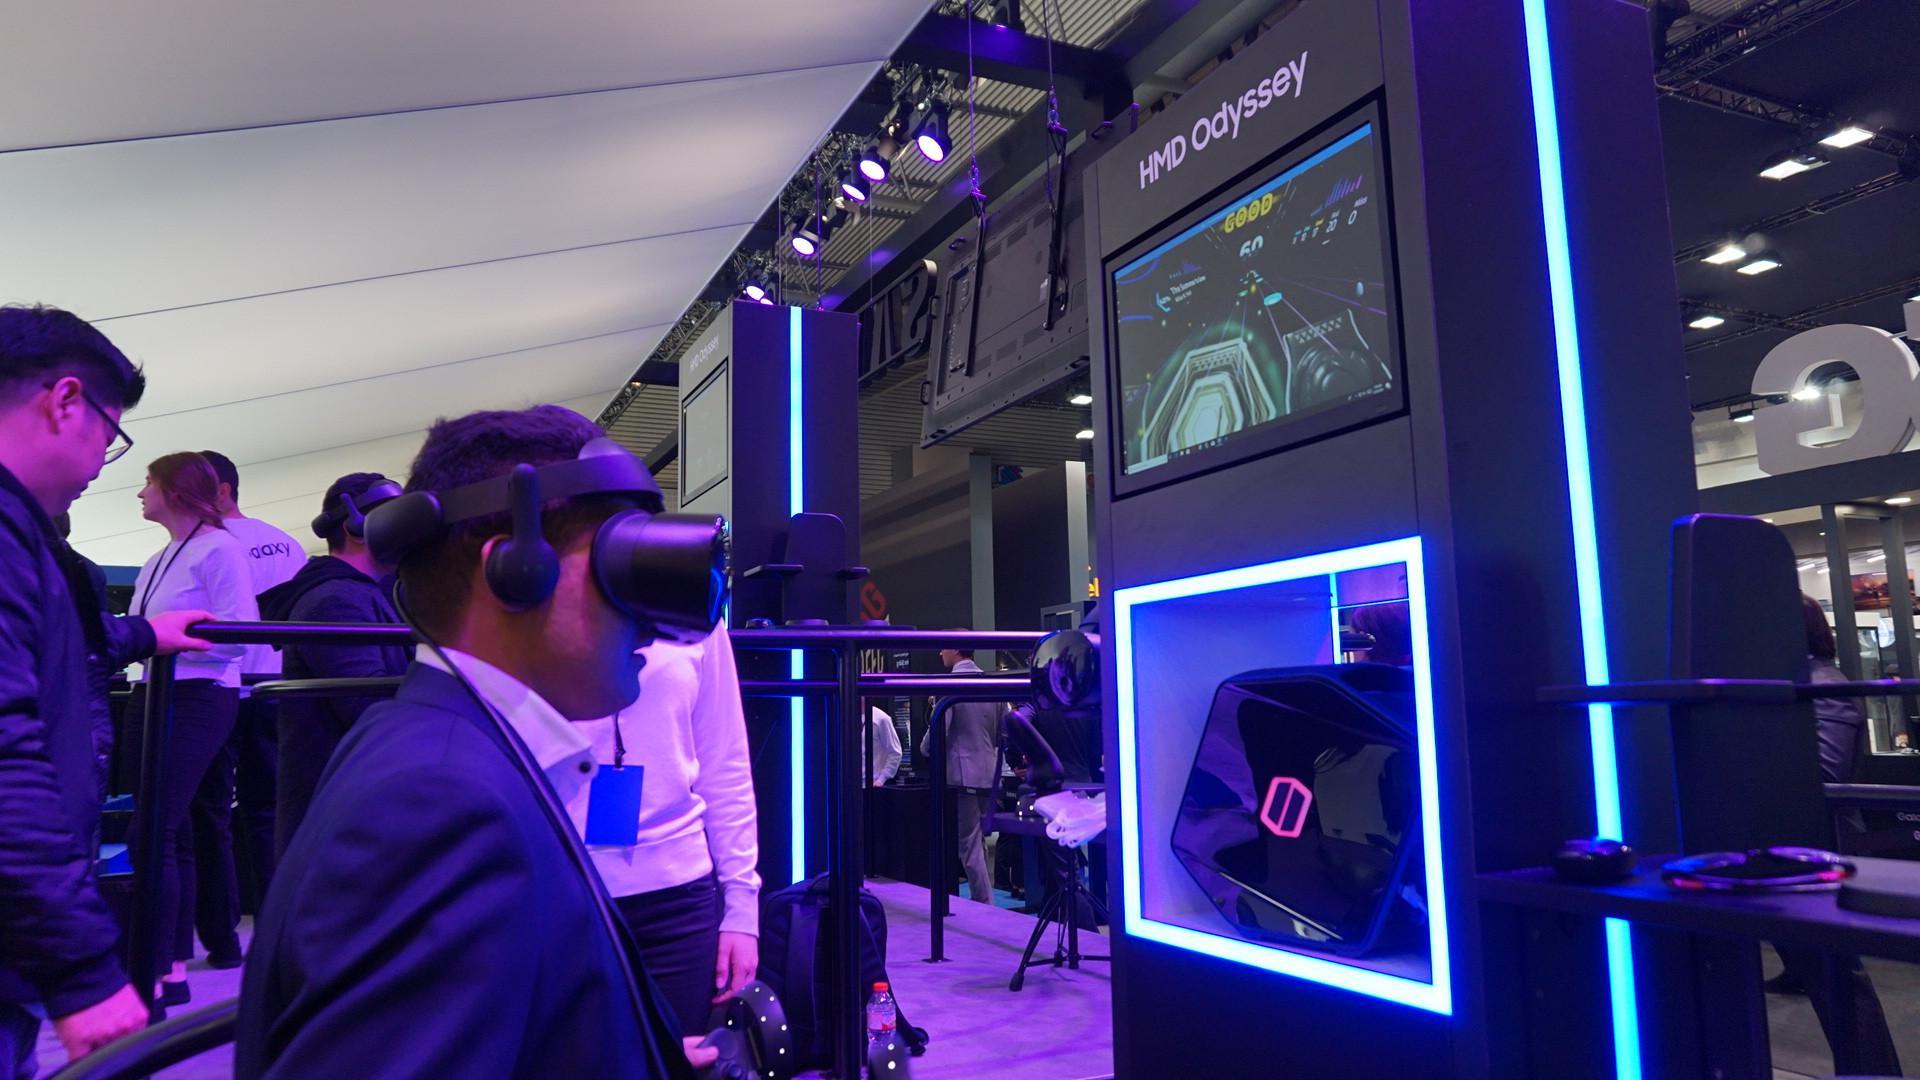 Pengunjung booth Samsung di MWC 2018 menjajal ekosistem Gear VR. (Liputan6.com/ Agustin Setyo W)